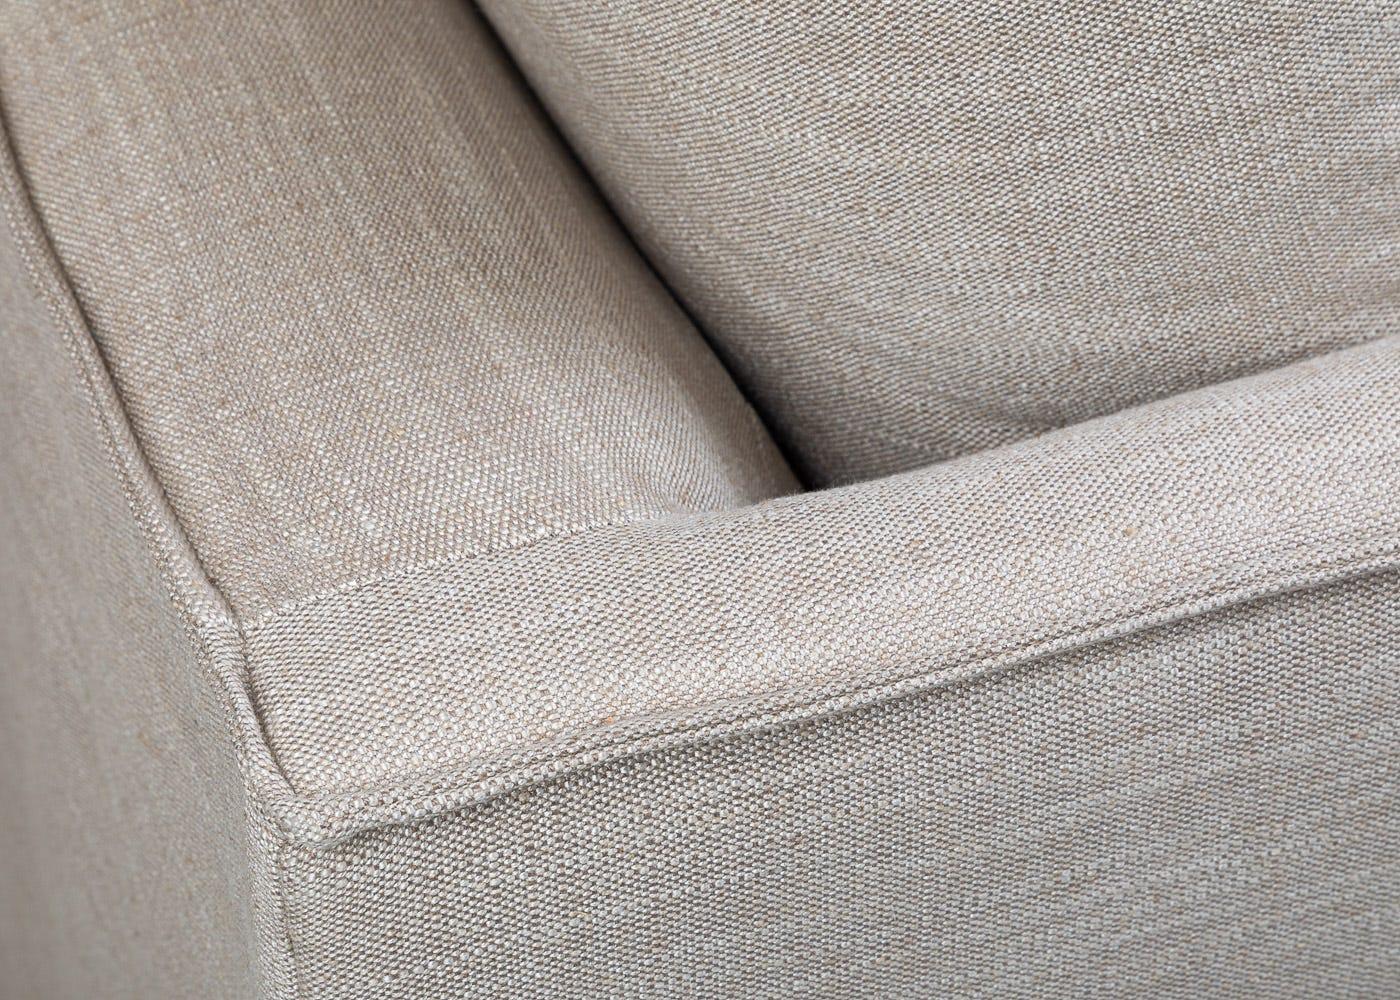 Tortona 3 Seater Sofa in Broad Weave Putty - Corner